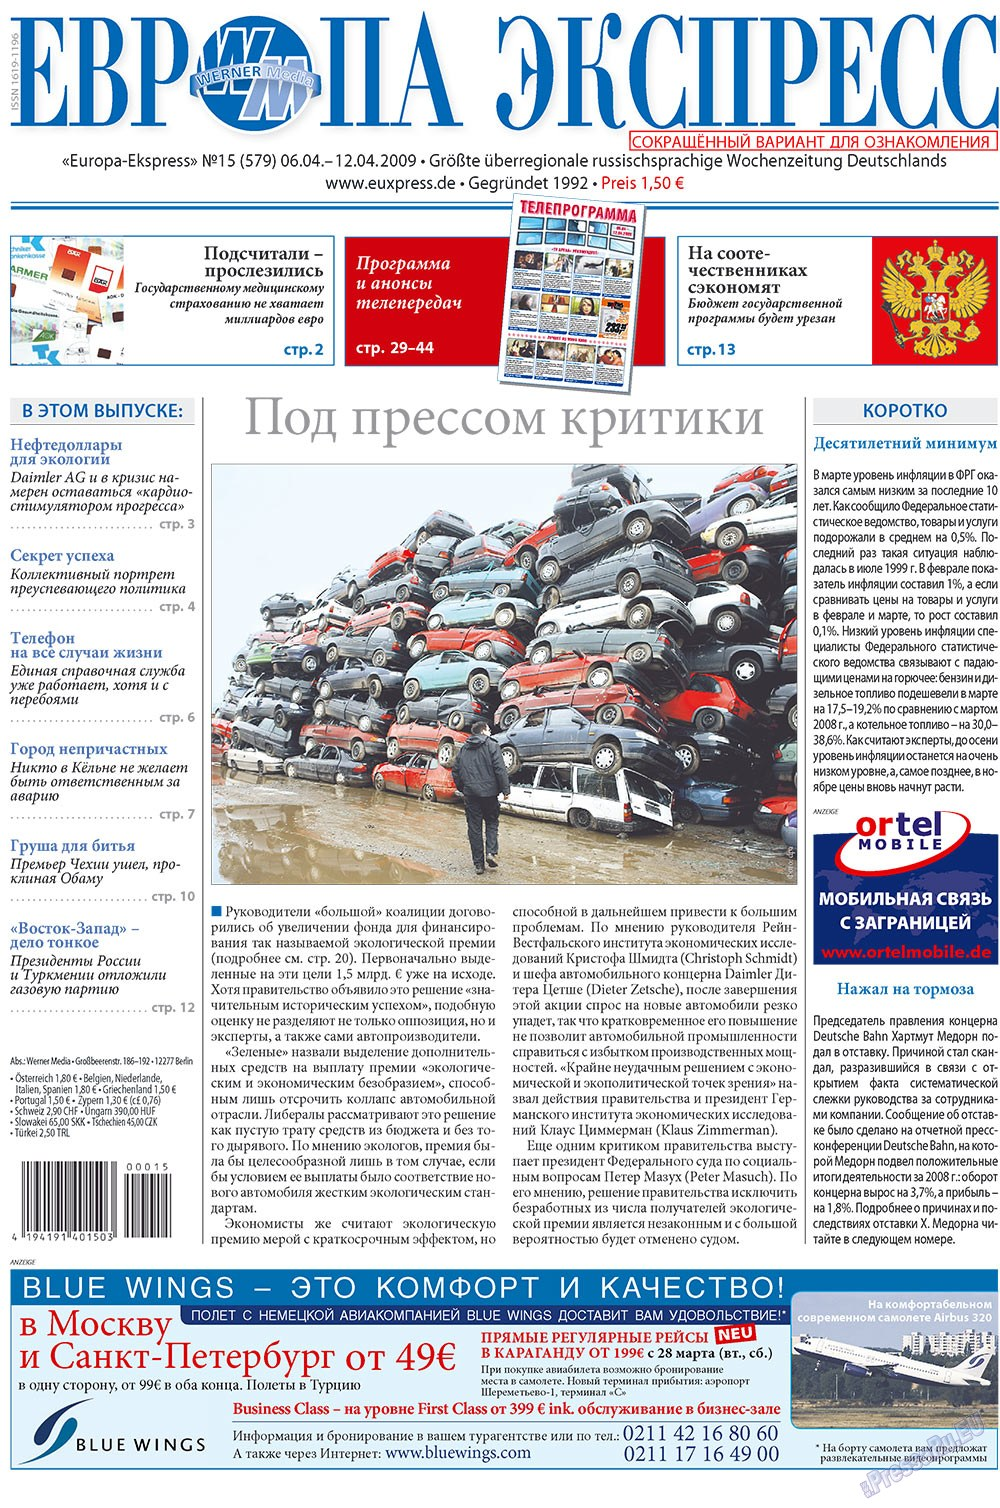 Европа экспресс (газета). 2009 год, номер 15, стр. 1